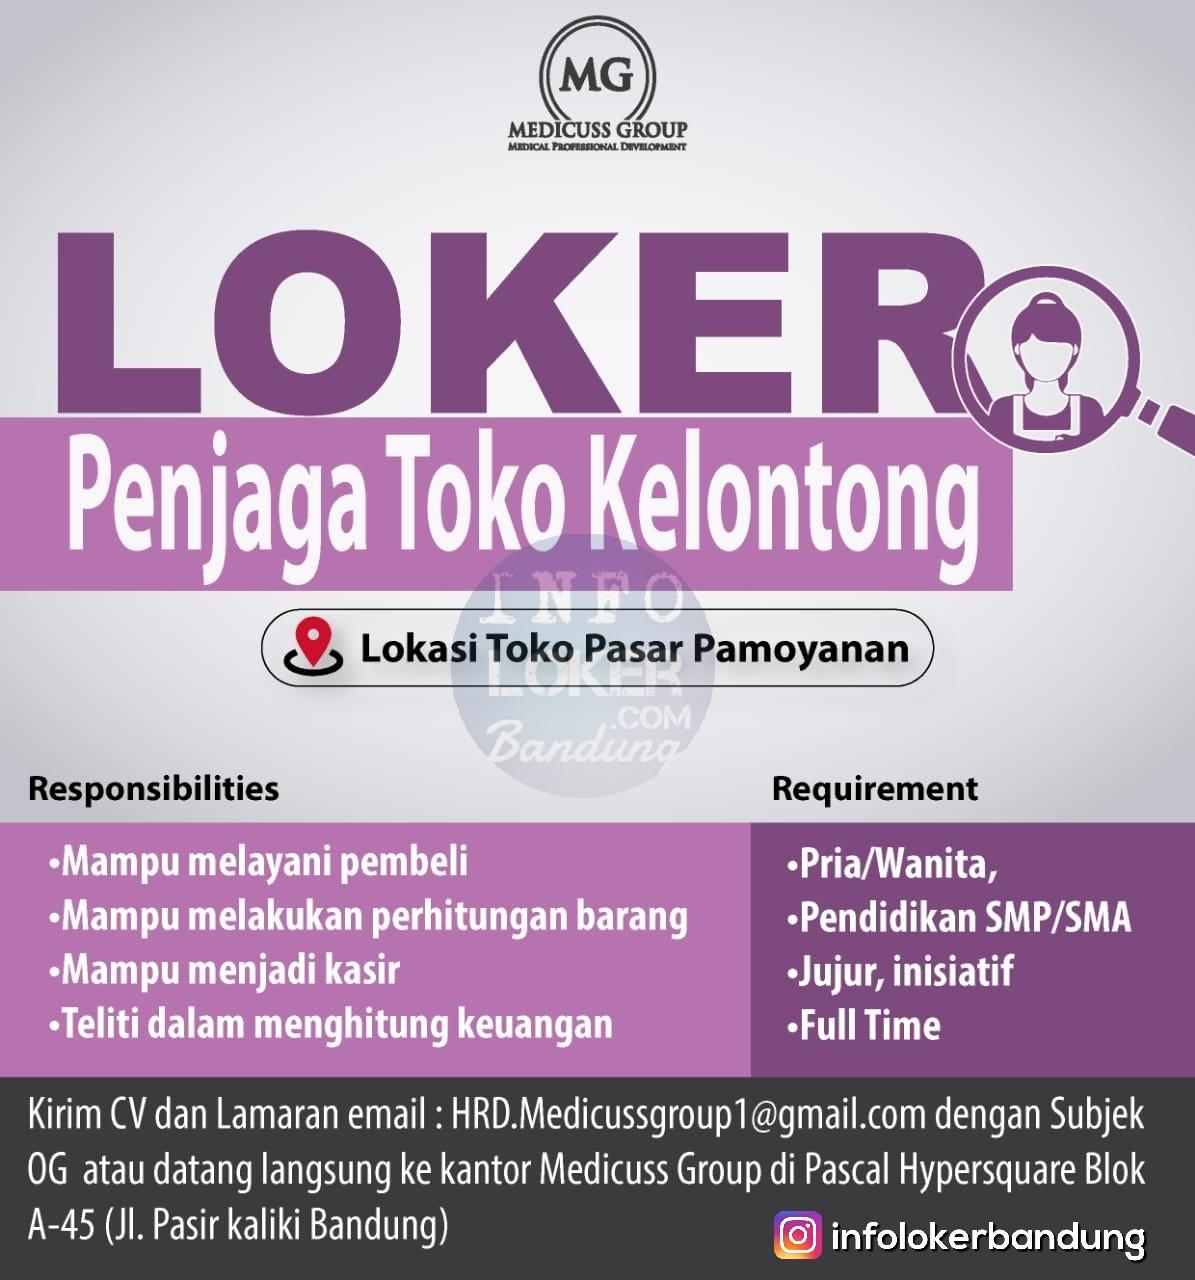 Lowongan Kerja Penjaga Toko Kelontong Medicuss Group Bandung Agustus 2018